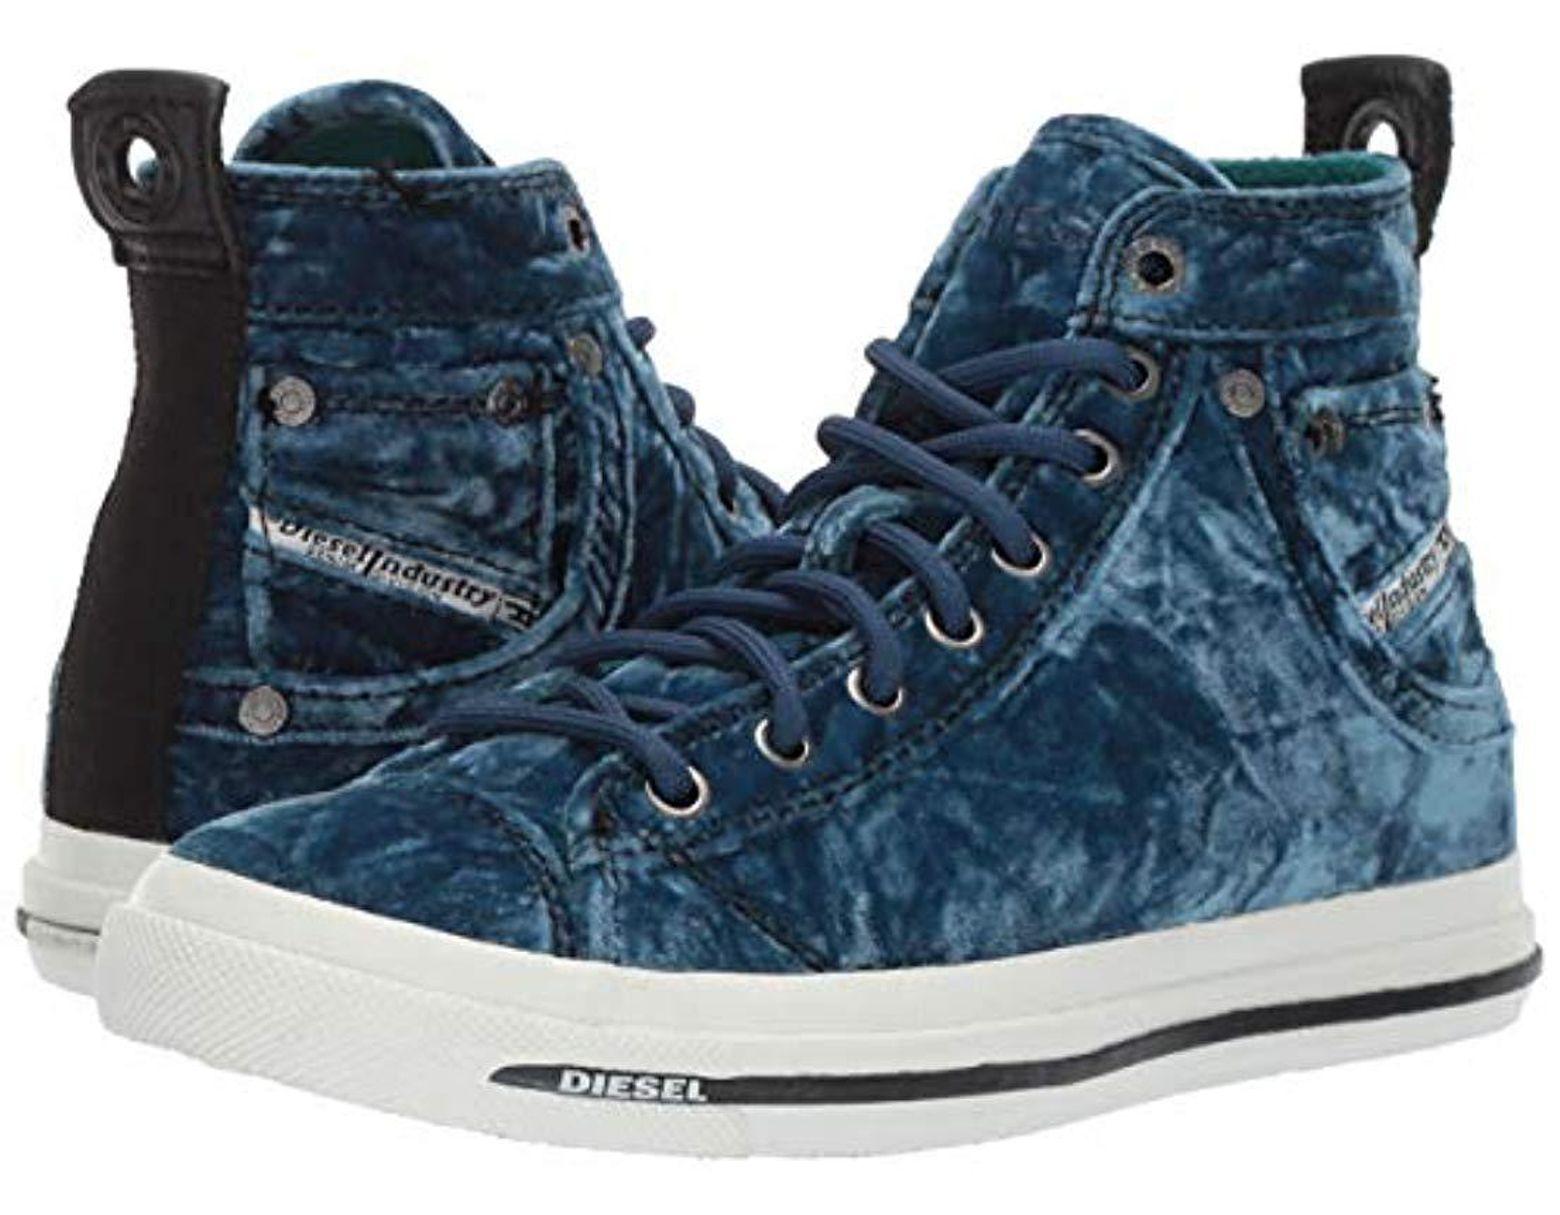 e88a23f33e DIESEL Magnete Exposure Iv W-sneaker Mid in Blue - Lyst